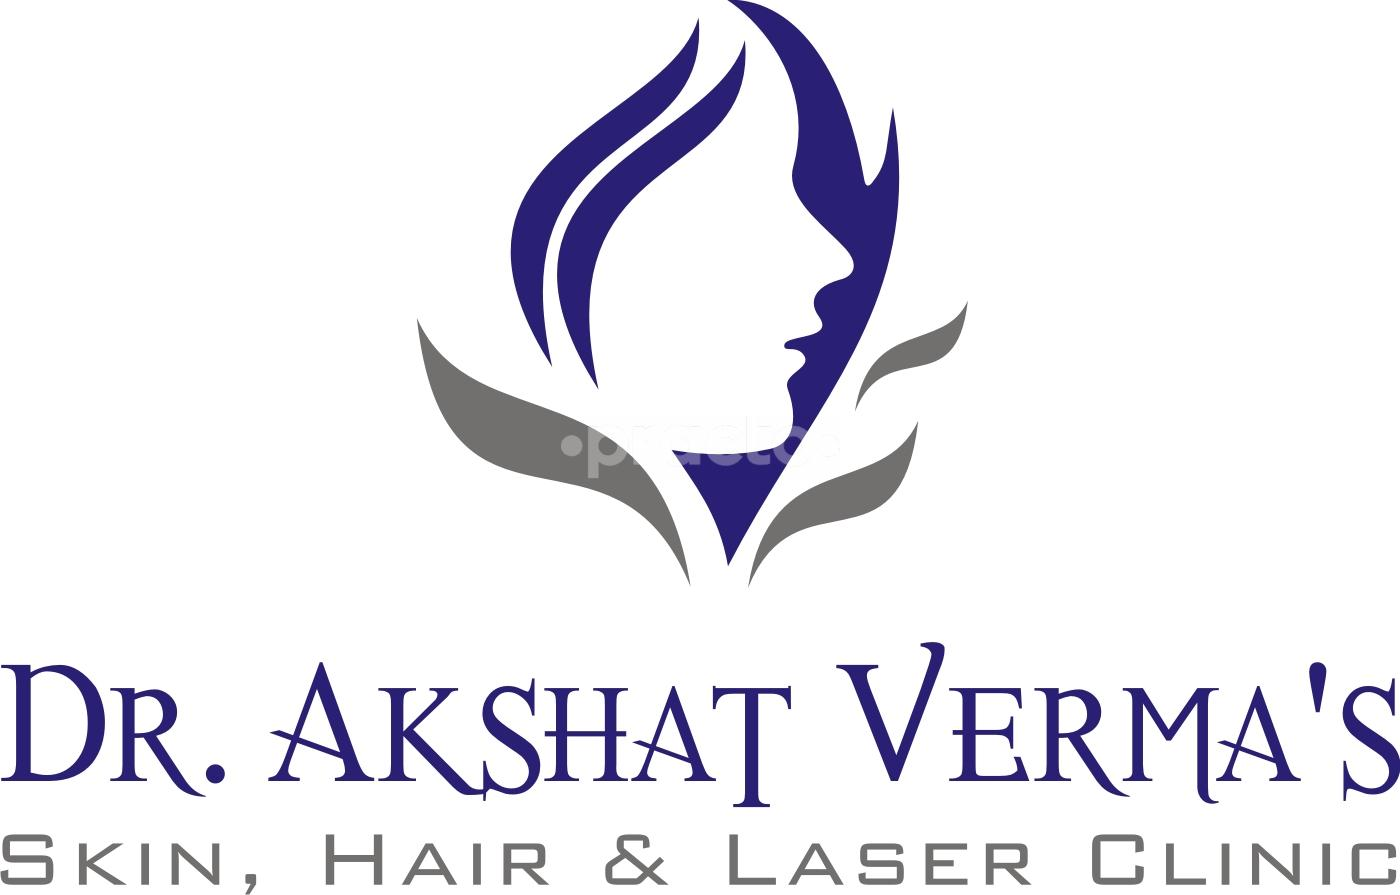 Dr. Akshat Verma's Skin Hair & Laser Clinic